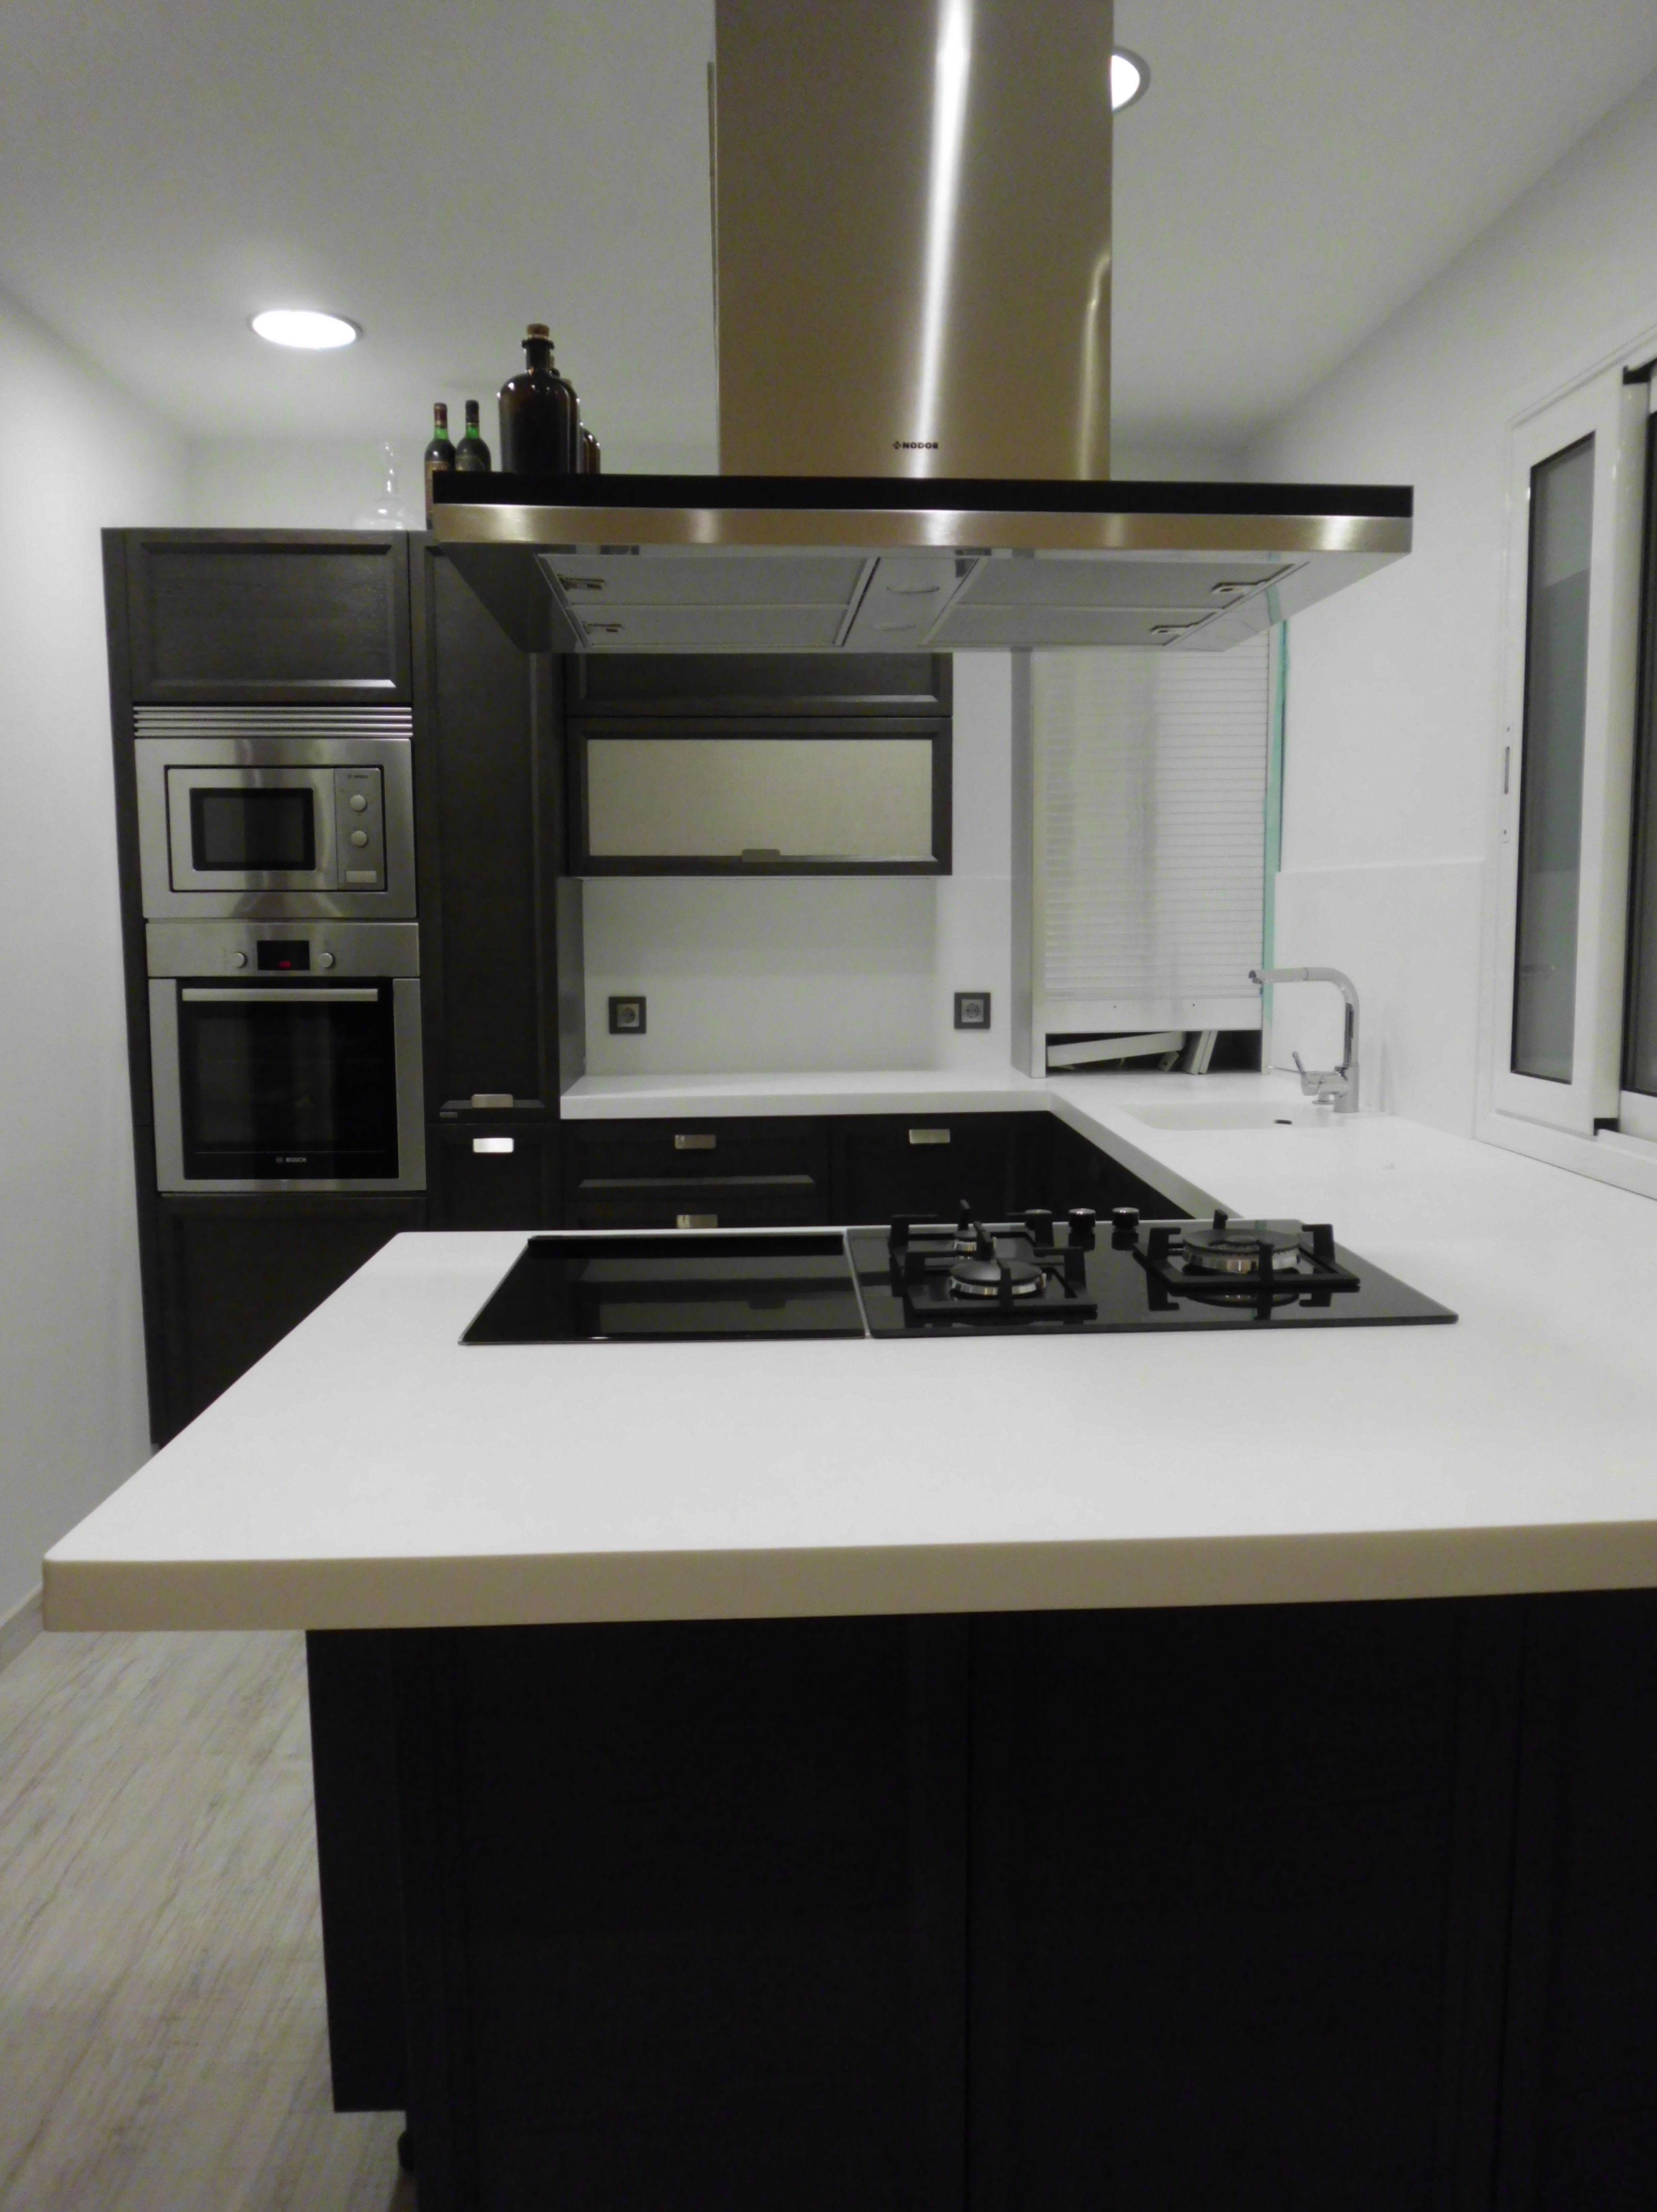 Reforma integral de calidad vivienda \u002D Cocina I (C/Felip II)